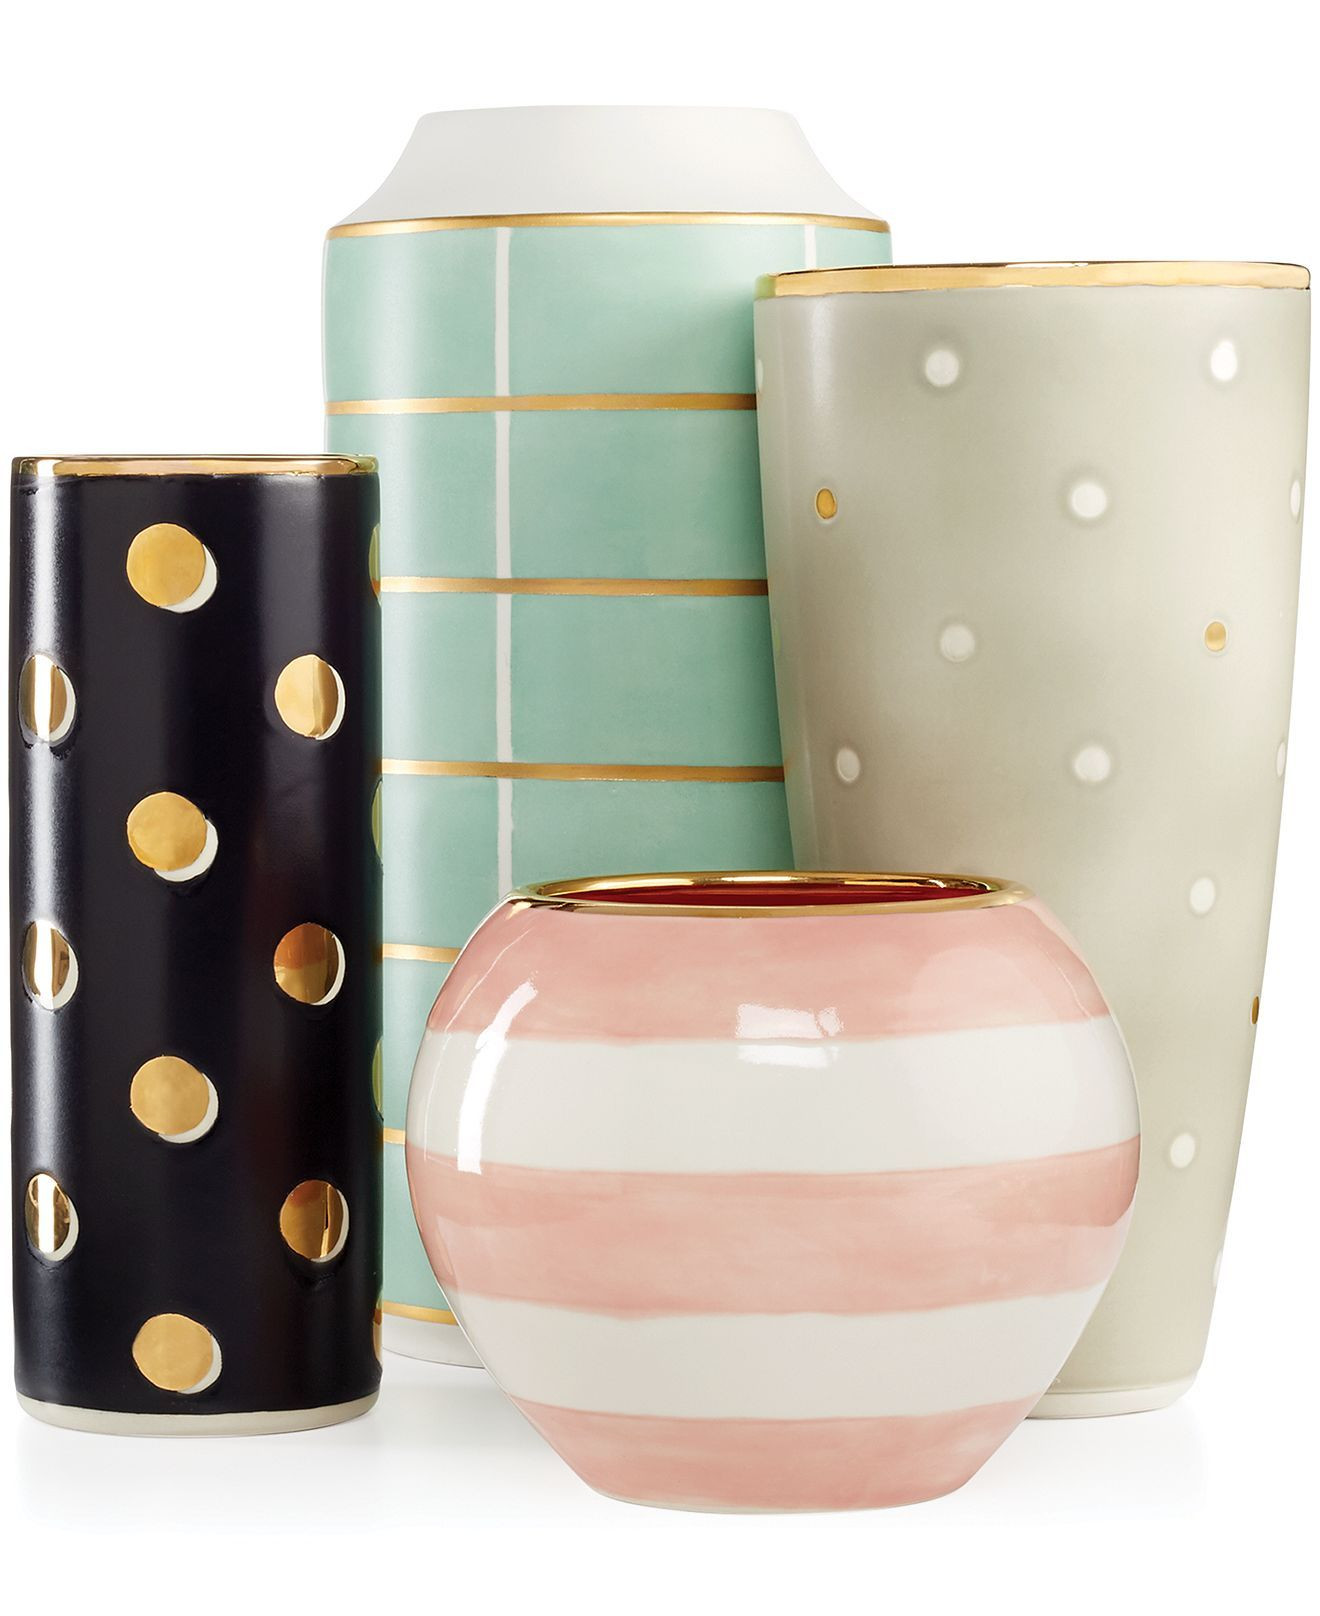 Macys Kate Spade Vase Of Kate Spade New York Sunset Street Vase Collection Macys Pink with Regard to Kate Spade New York Sunset Street Vase Collection Macys Pink White One for the Desk